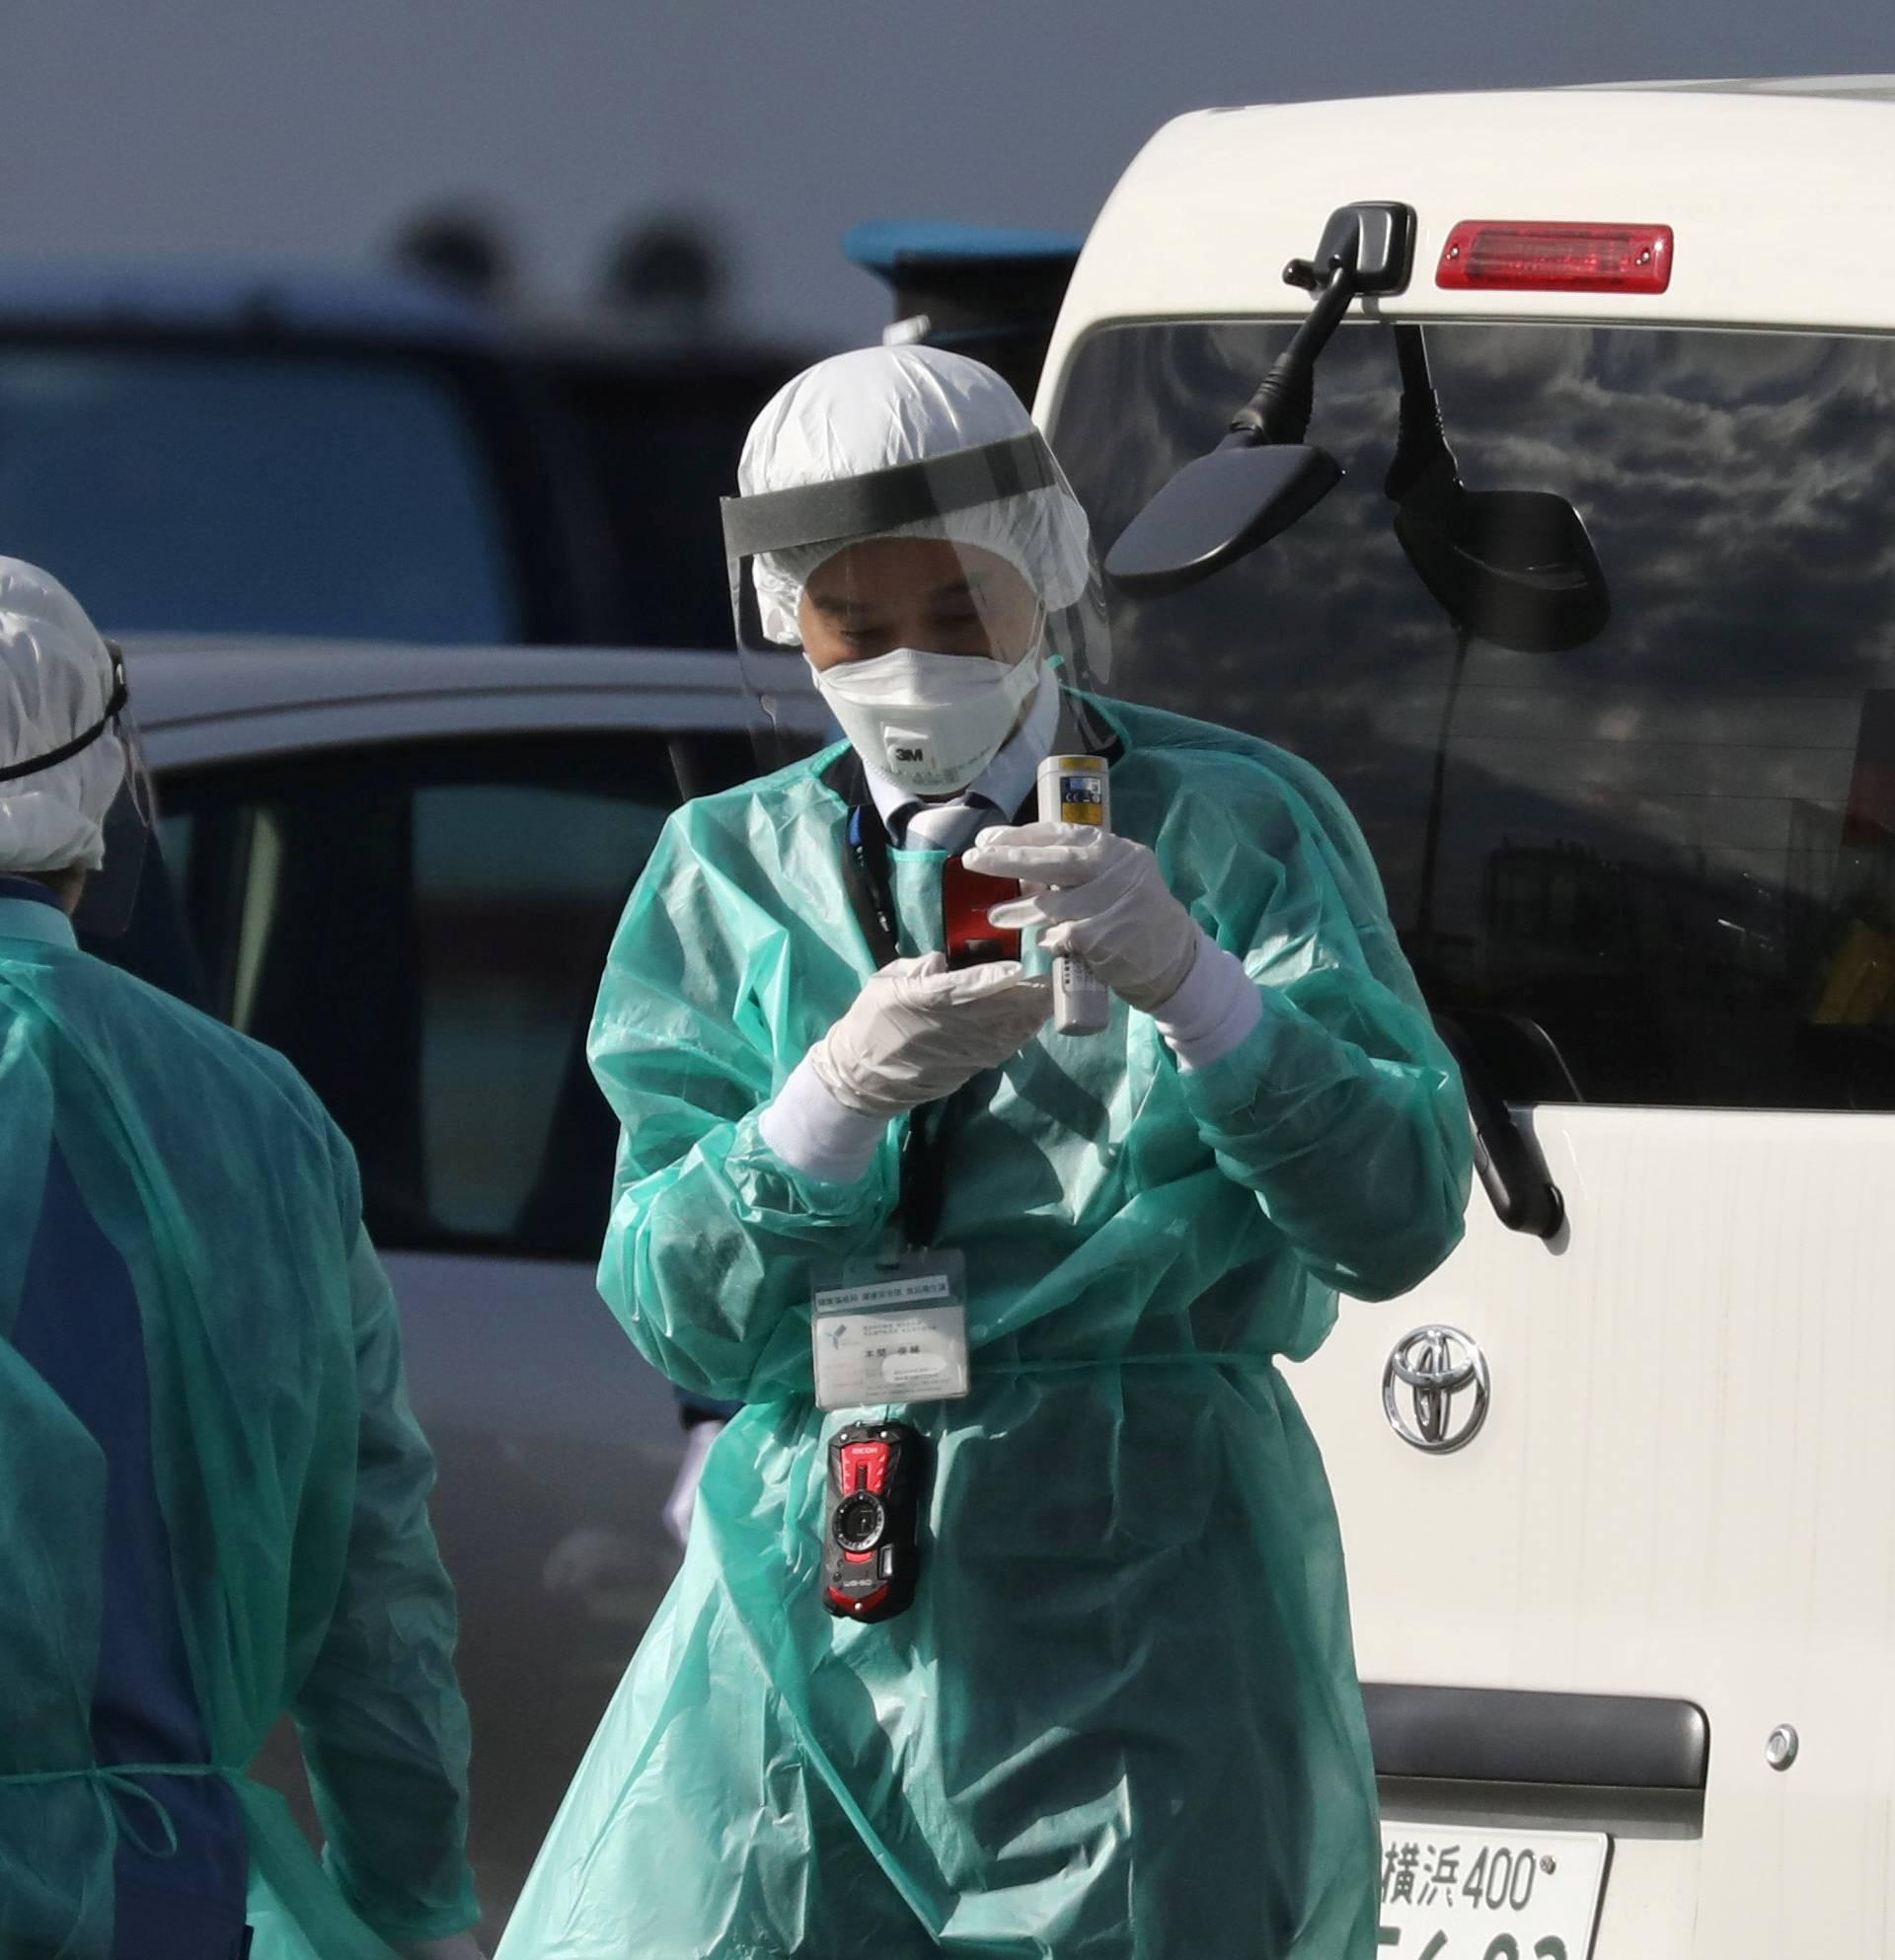 Health officials dressed in protective gear are seen near the cruise ship Diamond Princess at Daikoku Pier Cruise Terminal in Yokohama